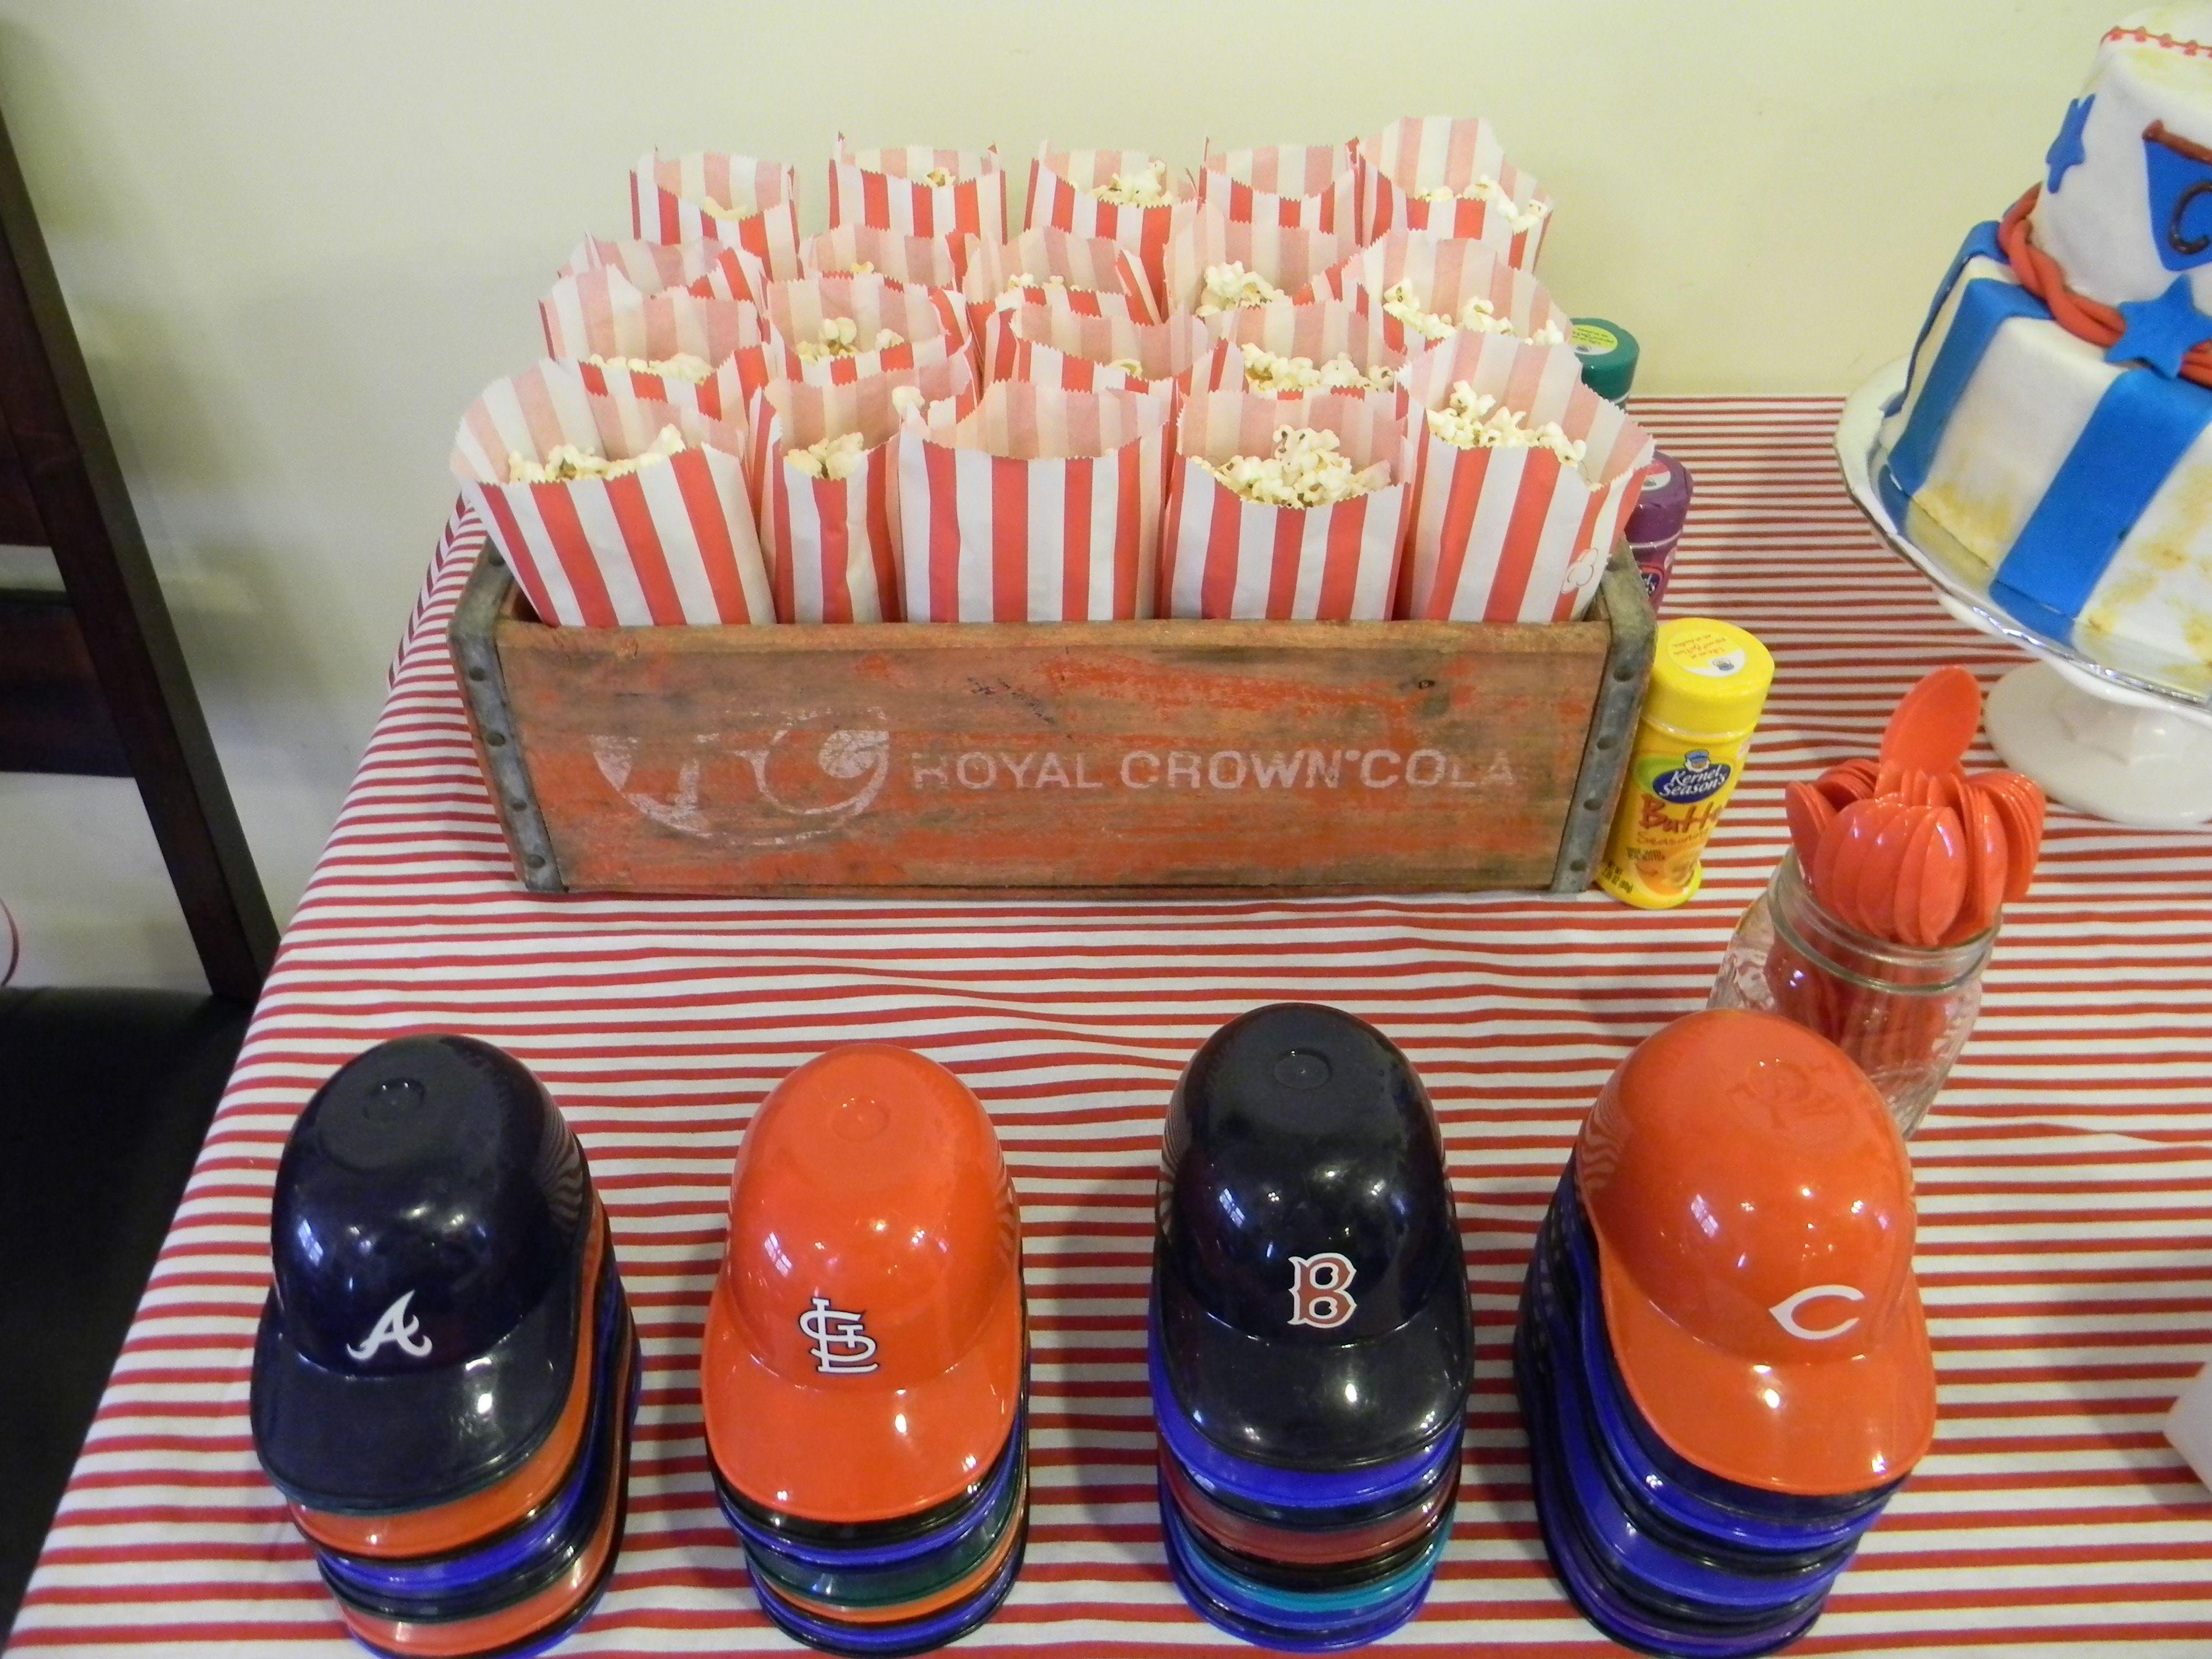 Popcorn and Baseball Hats for Ice Cream Sundays at Baseball Party